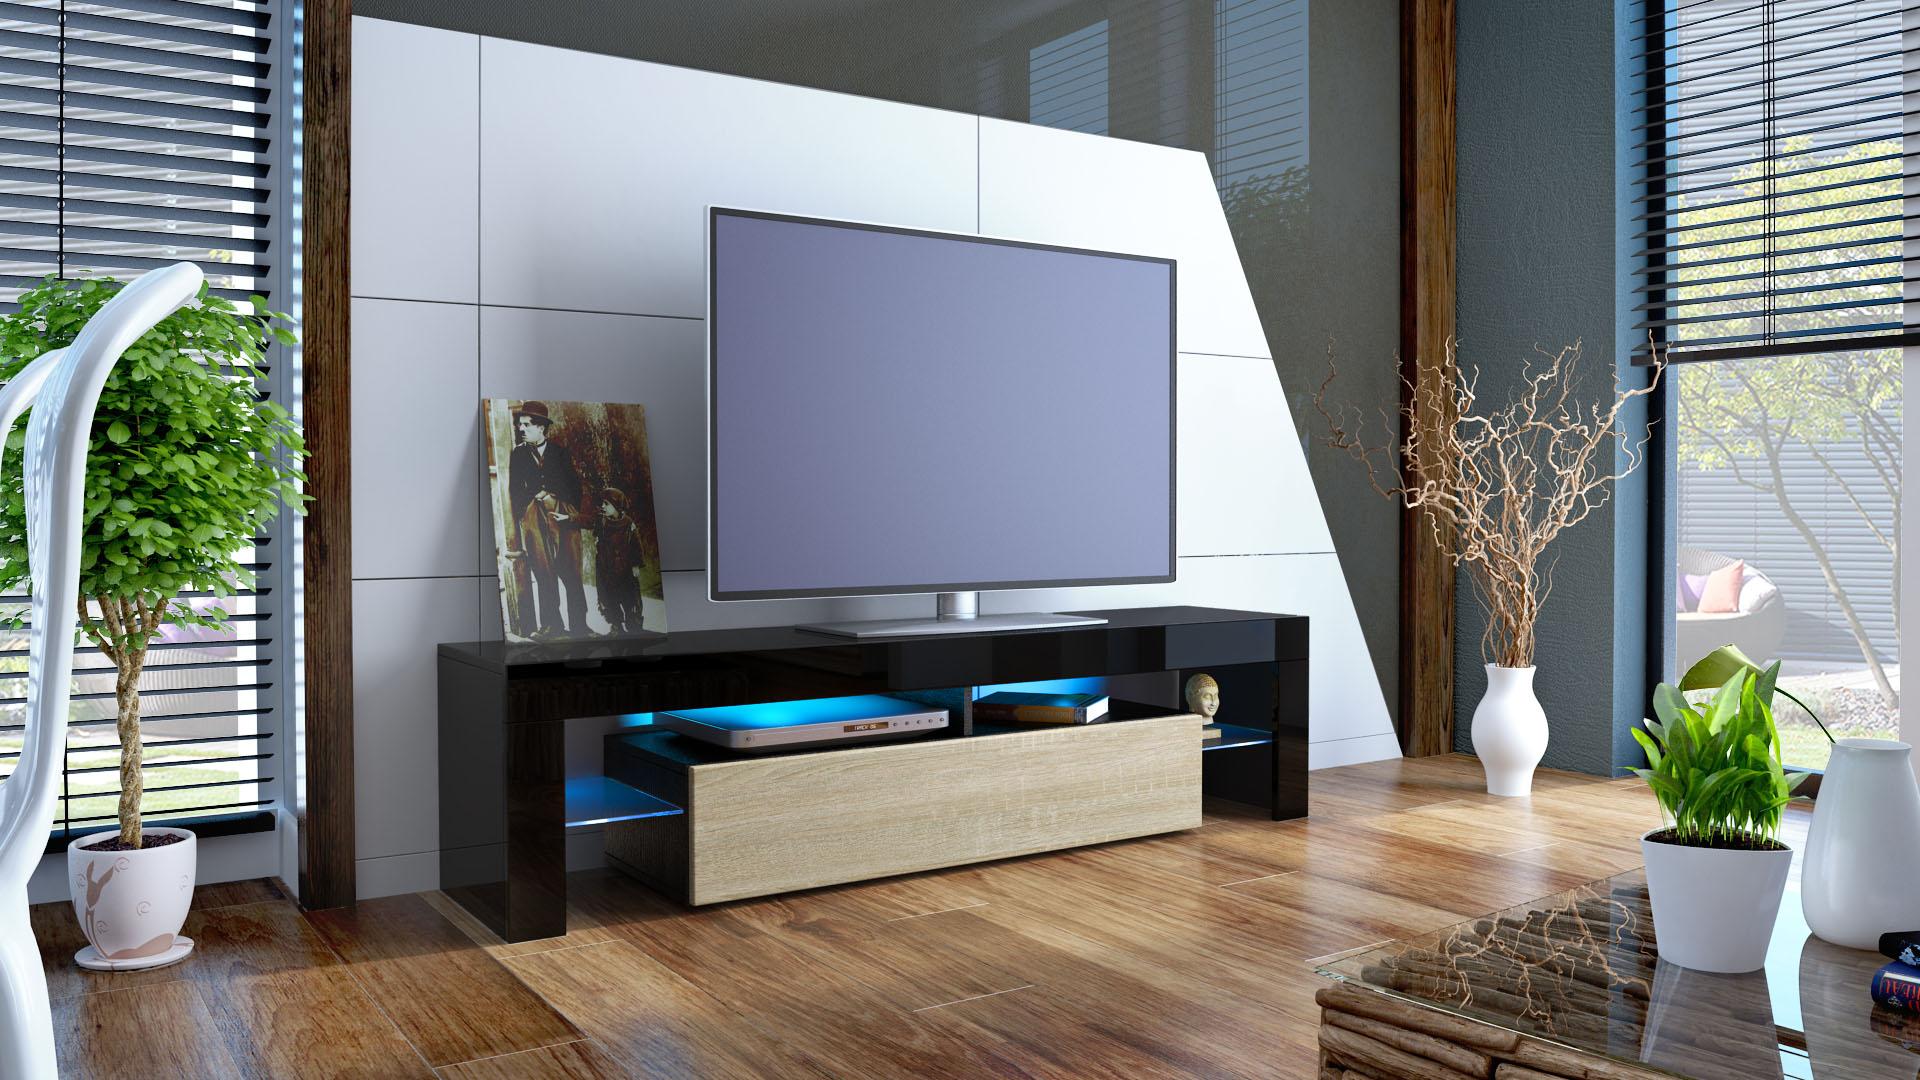 tv lowboard fernseh board schrank tisch m bel rack regal lima schwarz hochglanz ebay. Black Bedroom Furniture Sets. Home Design Ideas